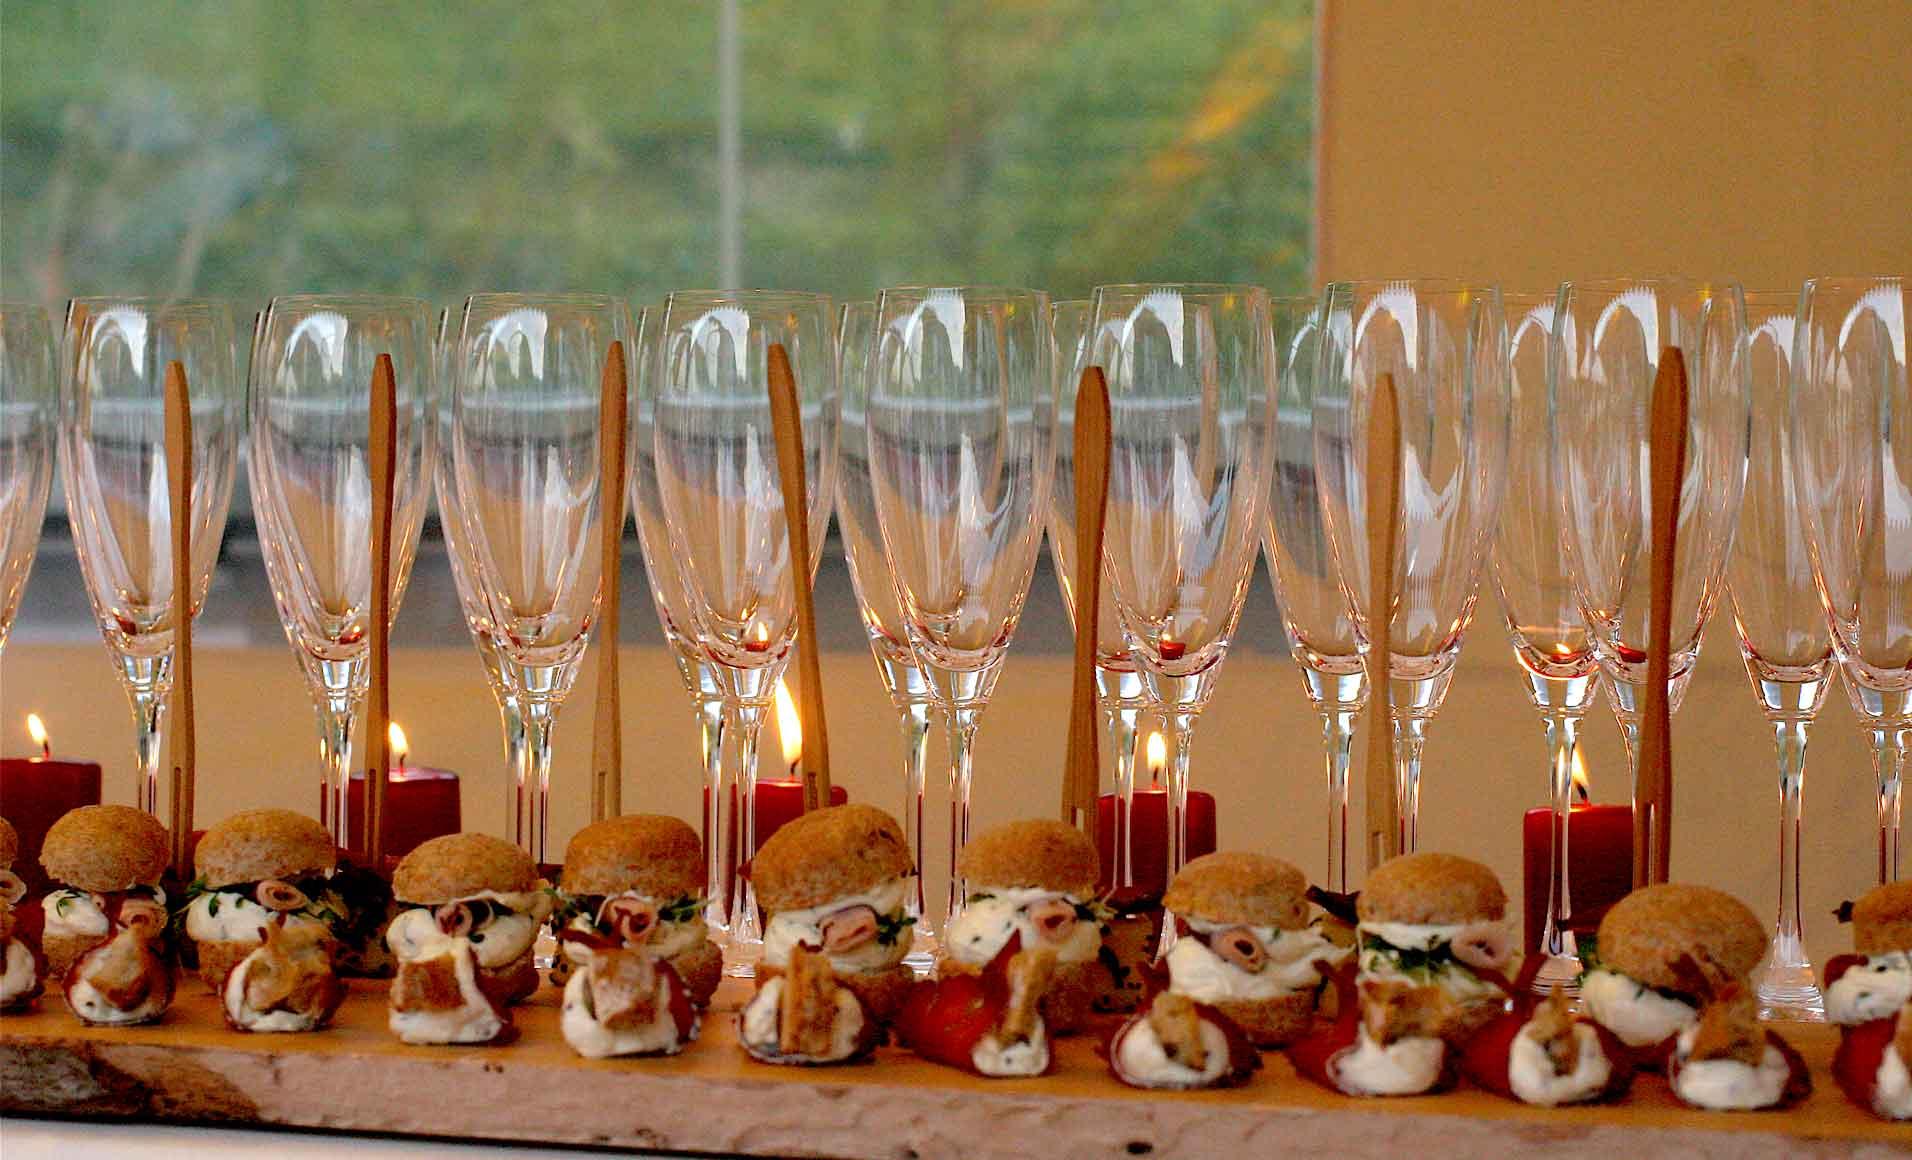 Eccezionale Idee Per Catering Buffet SE73 » Regardsdefemmes CT52